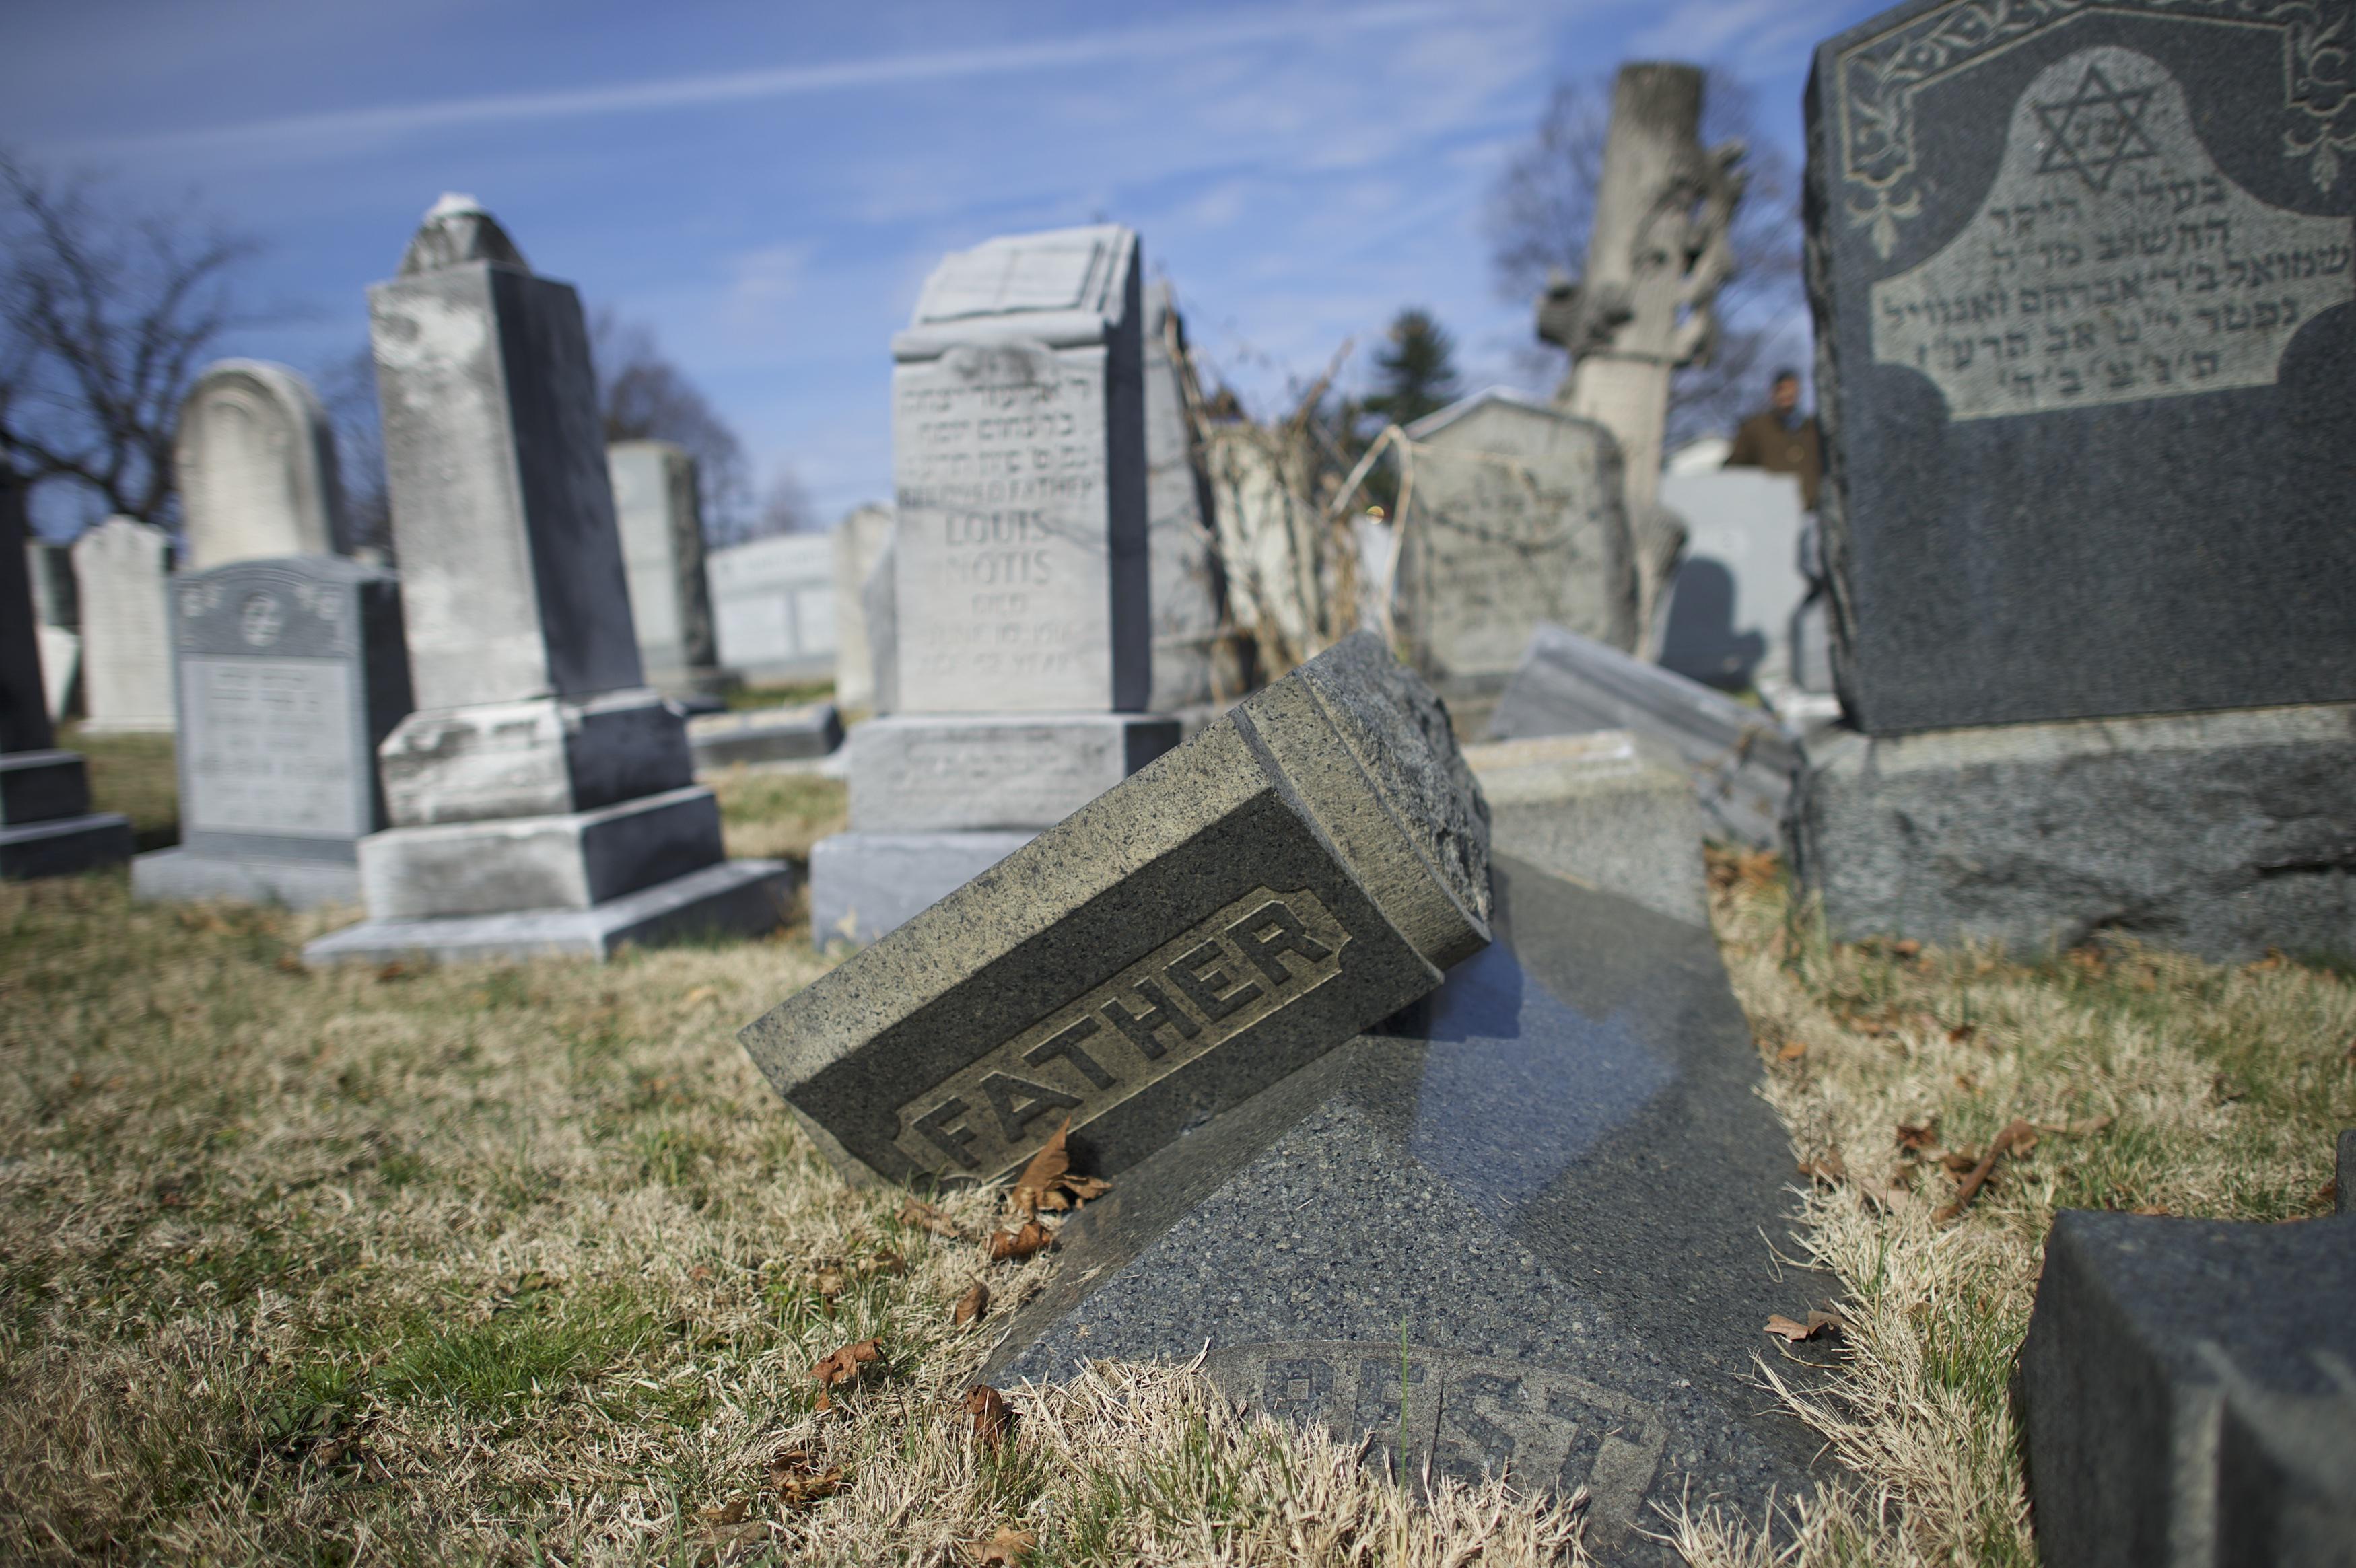 Jewish tombstones lay vandalized at Mount Carmel Cemetery February 27, 2017 in Philadelphia, Pennsylvania.  (Mark Makela--Getty Images)